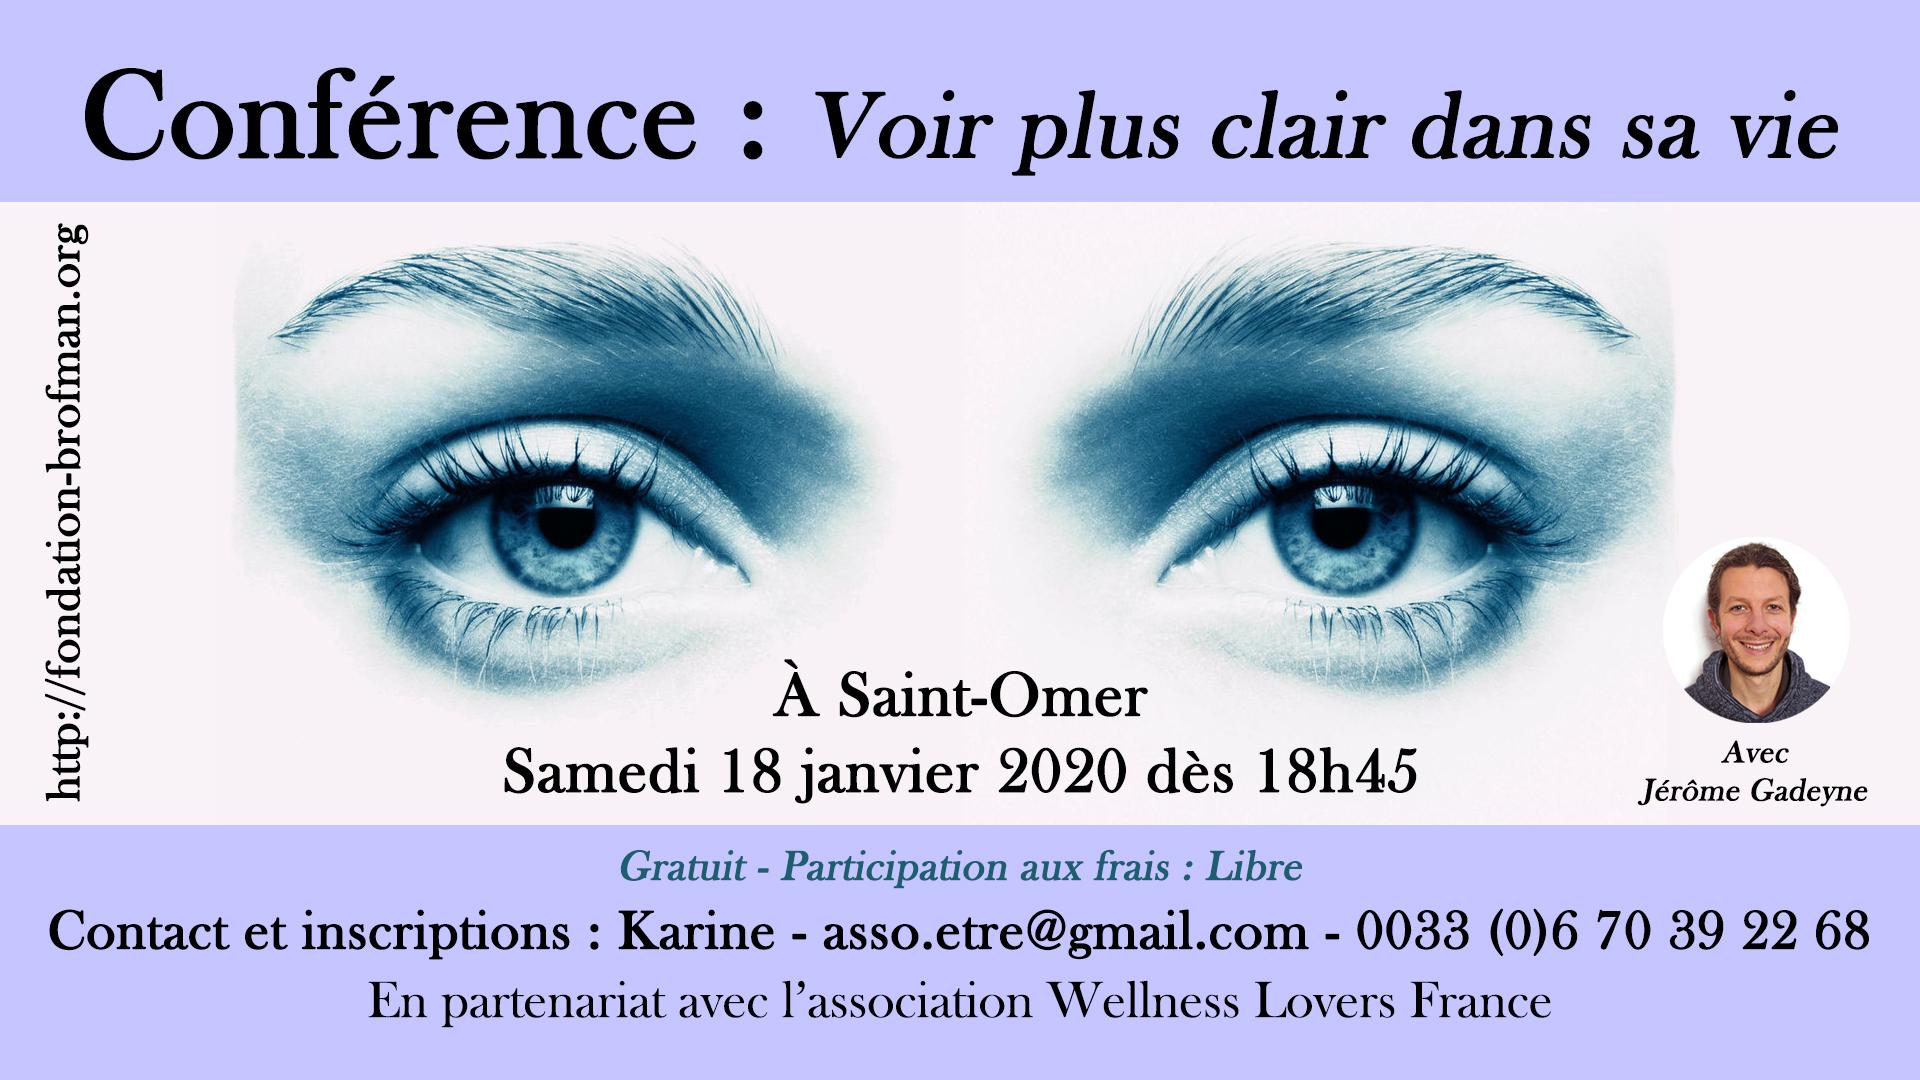 Conf Voir plus clair dans sa vie - St-Omer